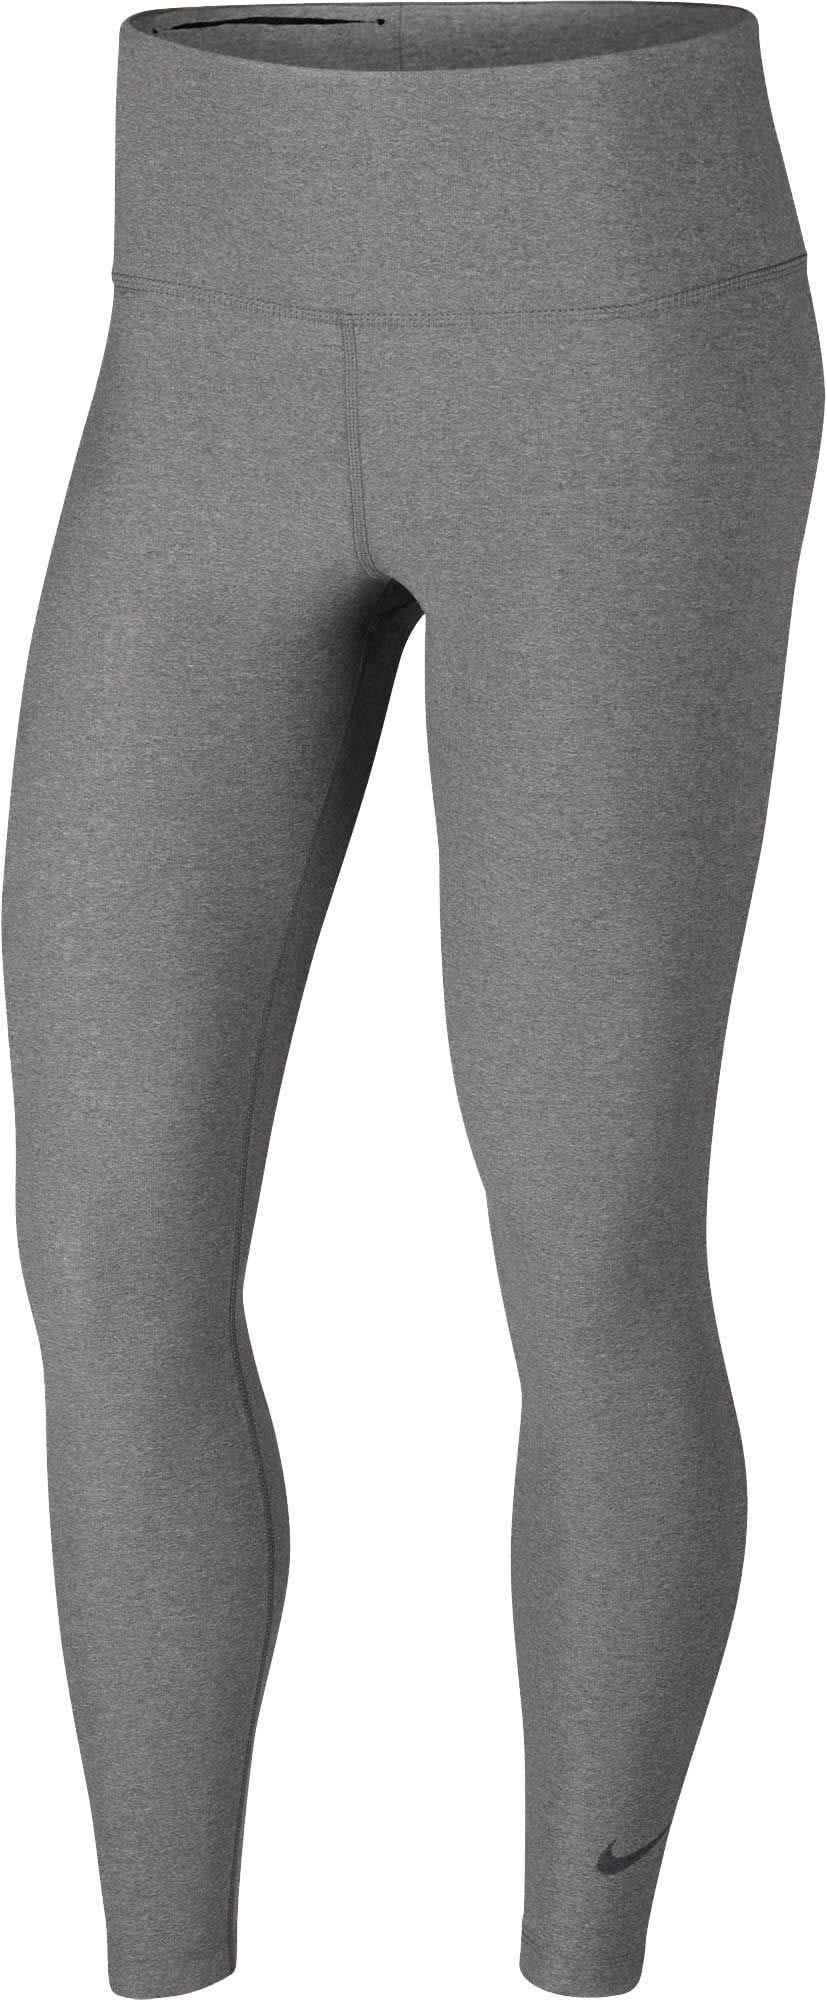 Nike Womens Sculpt Hyper Tights (Dk Grey Heather, Medium)